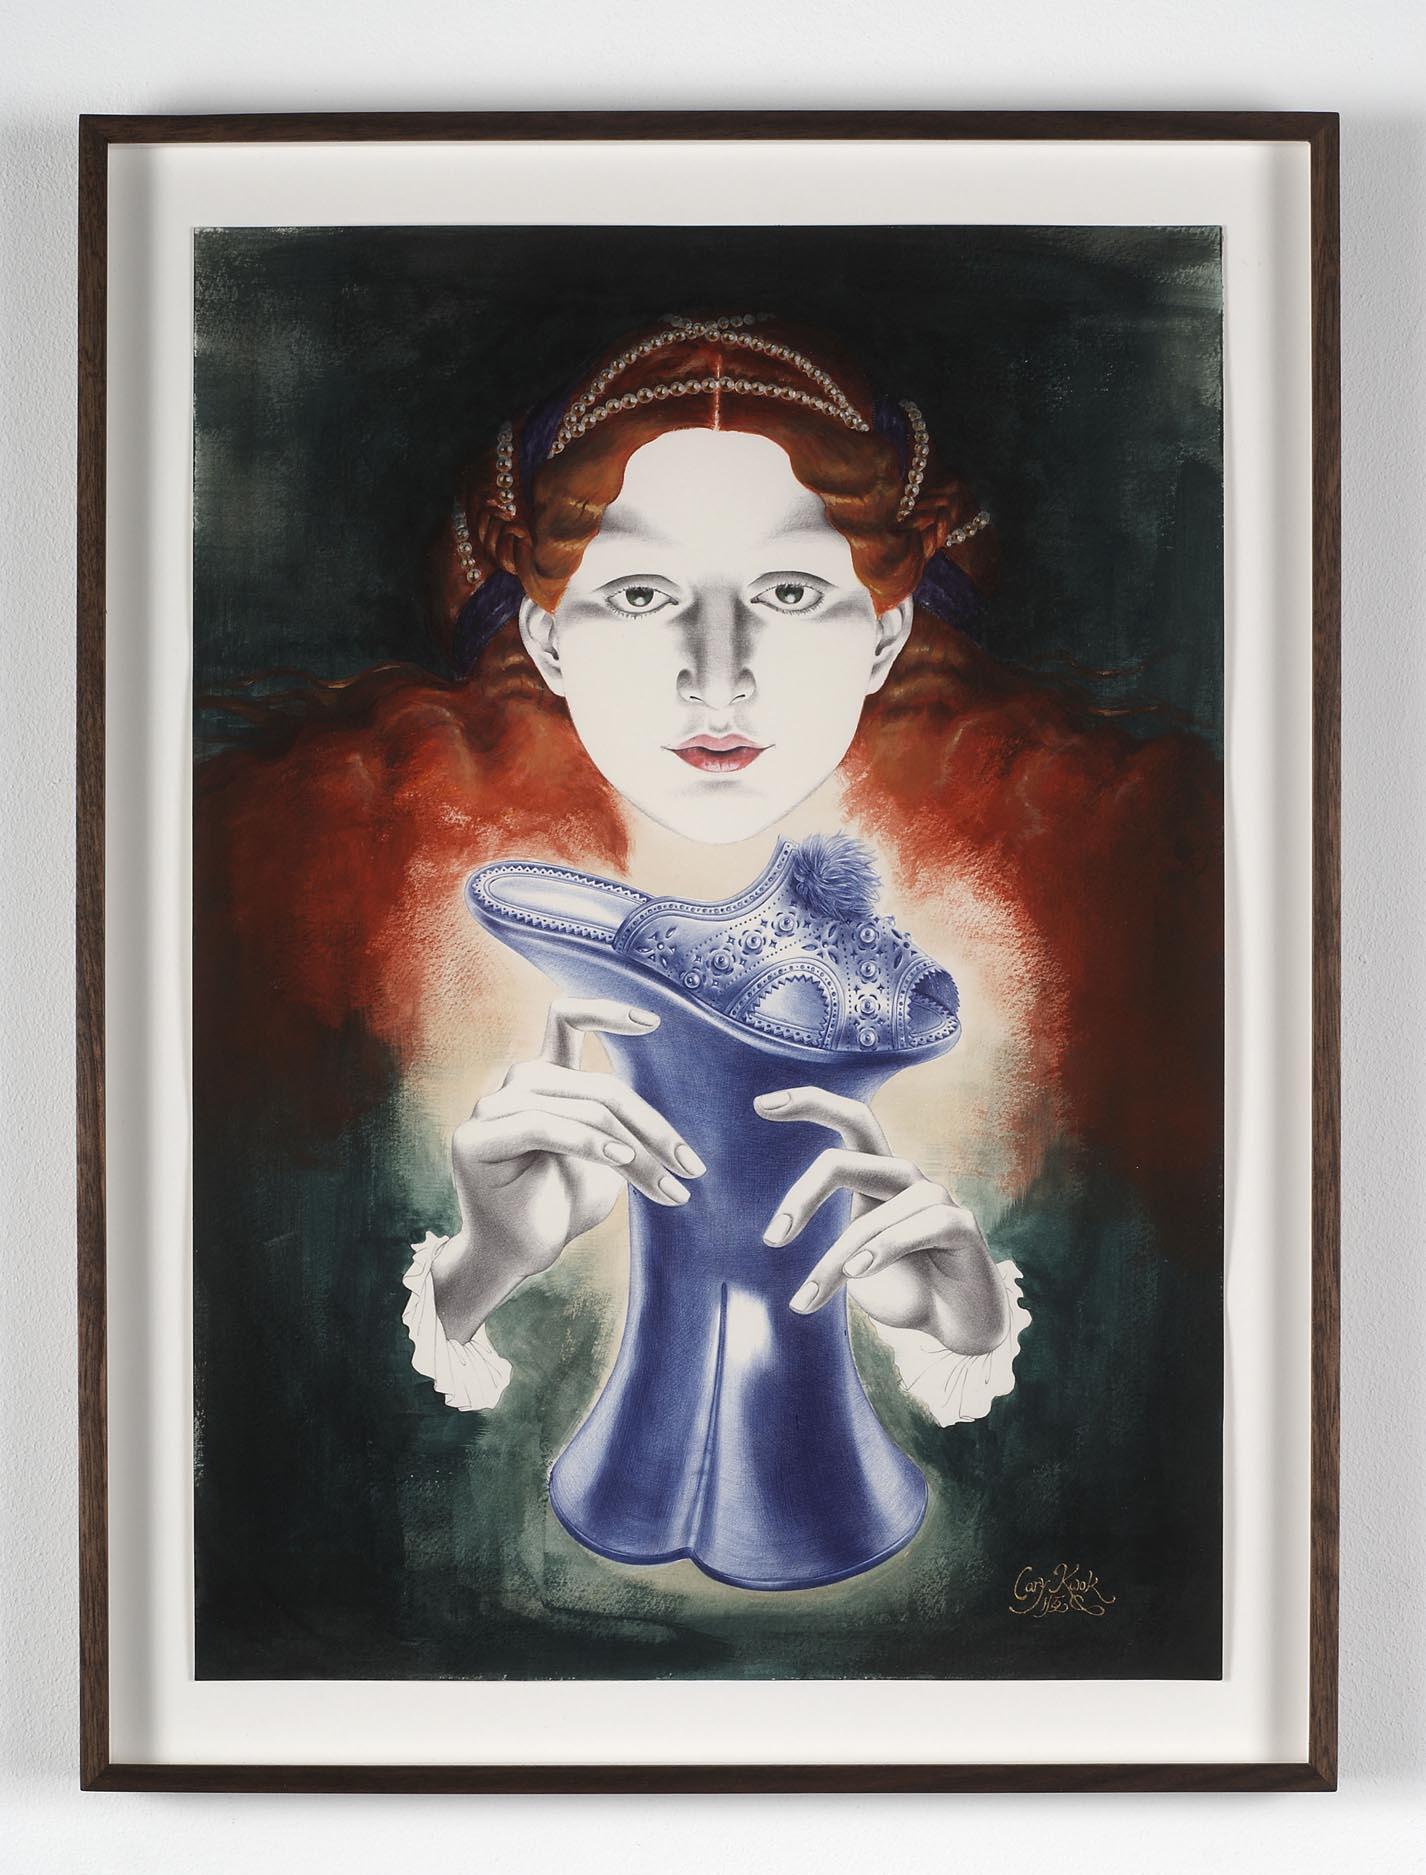 Desire - Venetian (Italian Renaissance) 2009 acrylic and ink on paper 42 x 29.7 cm